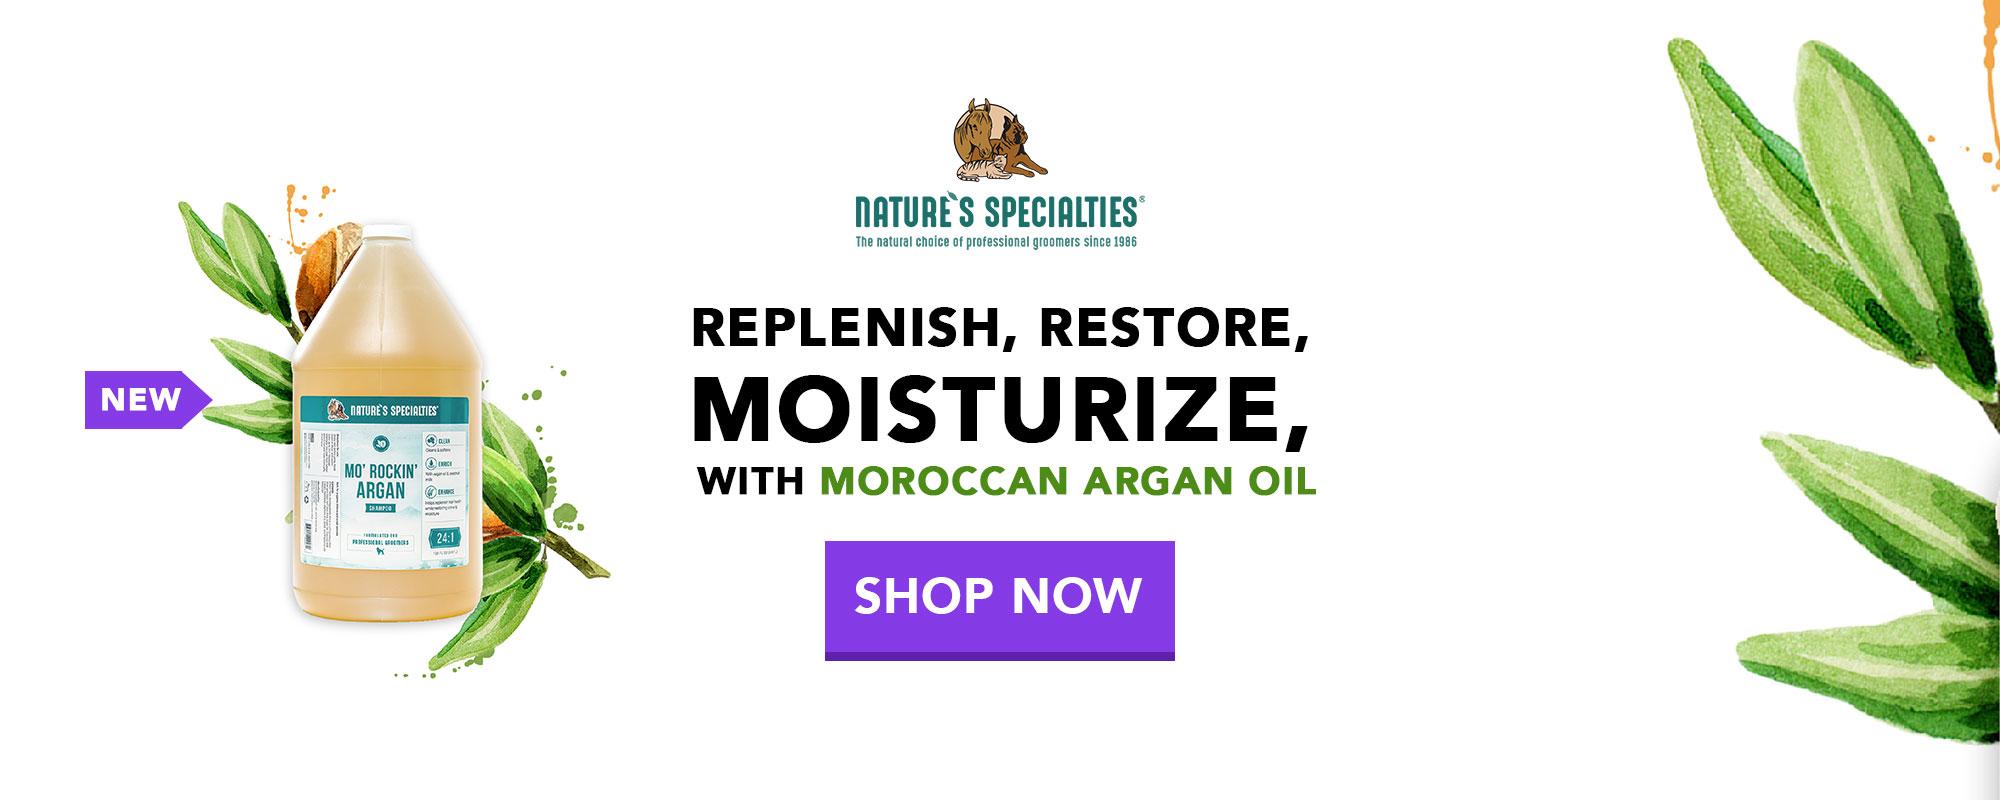 New Mo Rockin' Argan Shampoo from Nature's Specailties - replenish, restore & moisturize